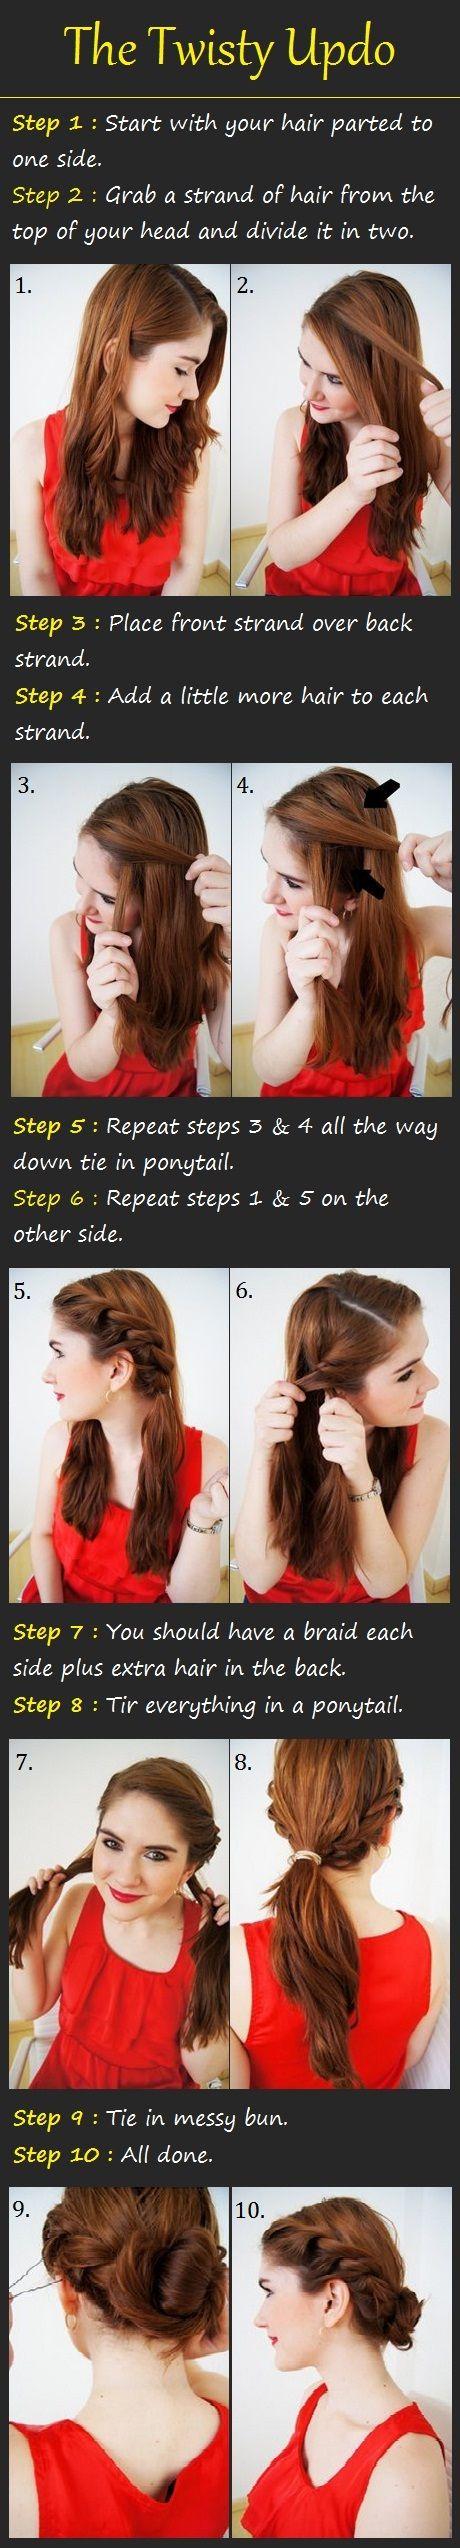 Beauty Tutorials: Hair tutorials: French Braids, Hair Tutorials, Up Do, Beautiful Tutorials, Long Hair, Twisti Updo, Hair Style, Updo Tutorials, Easy Updo